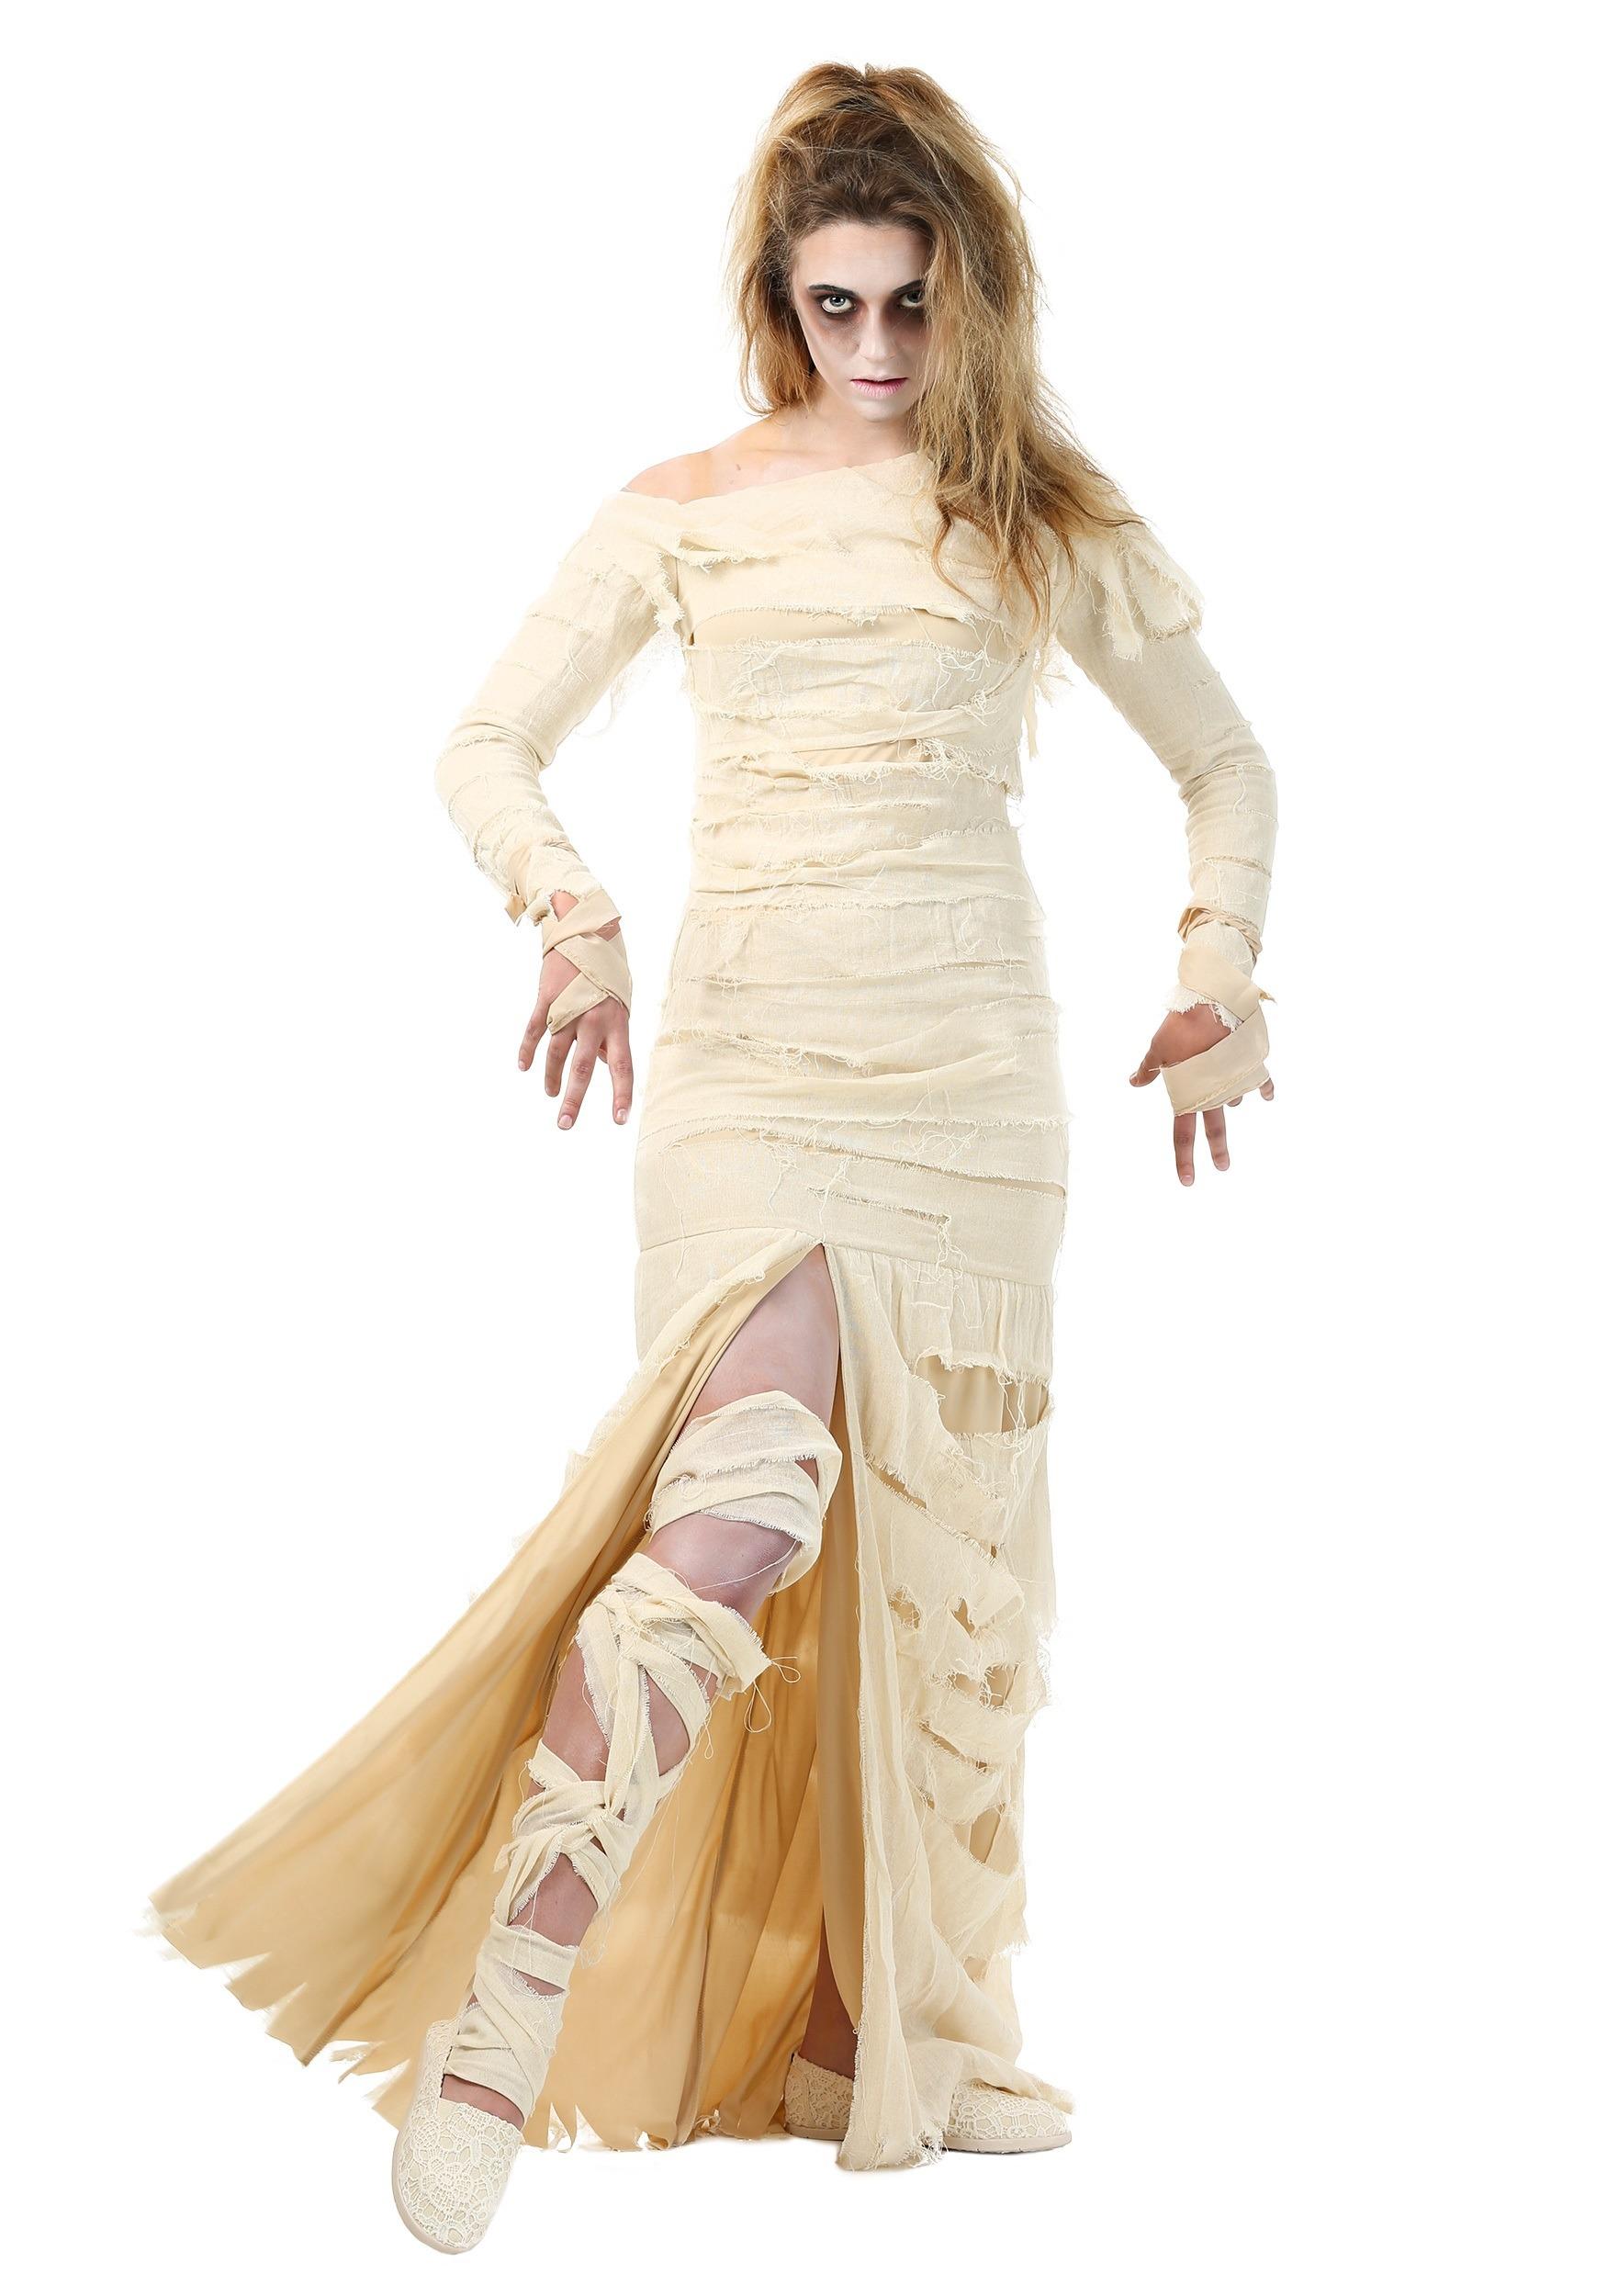 Full Length Women's Mummy Costume